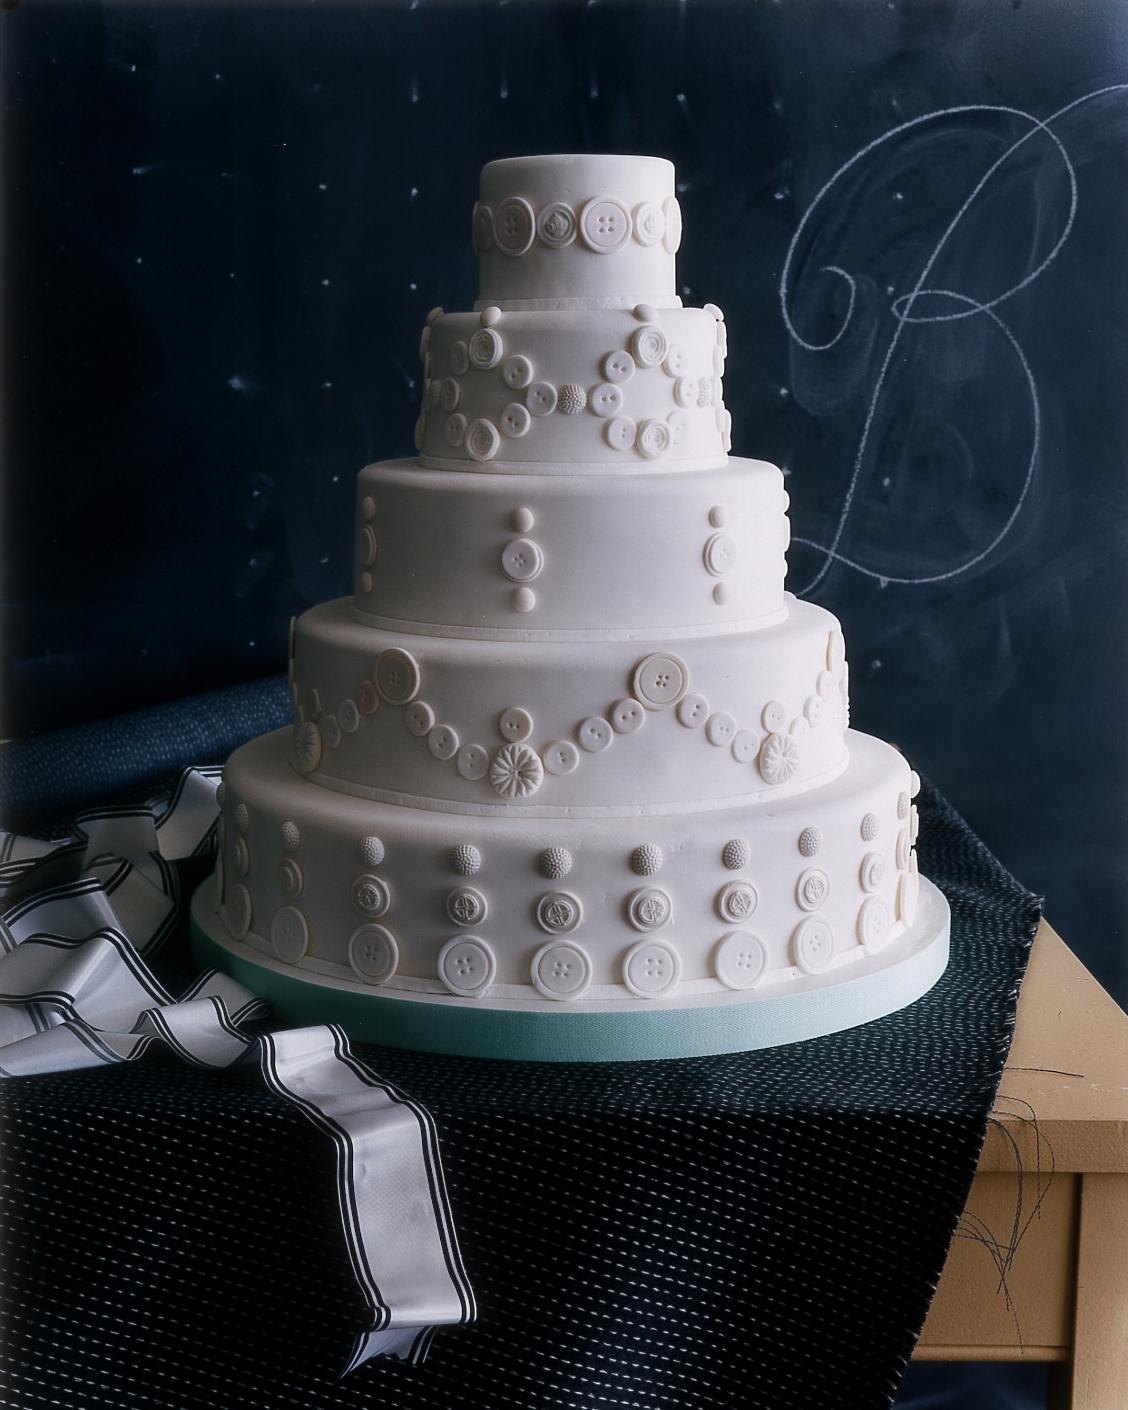 weddings-wa101750-buttoncake.jpg